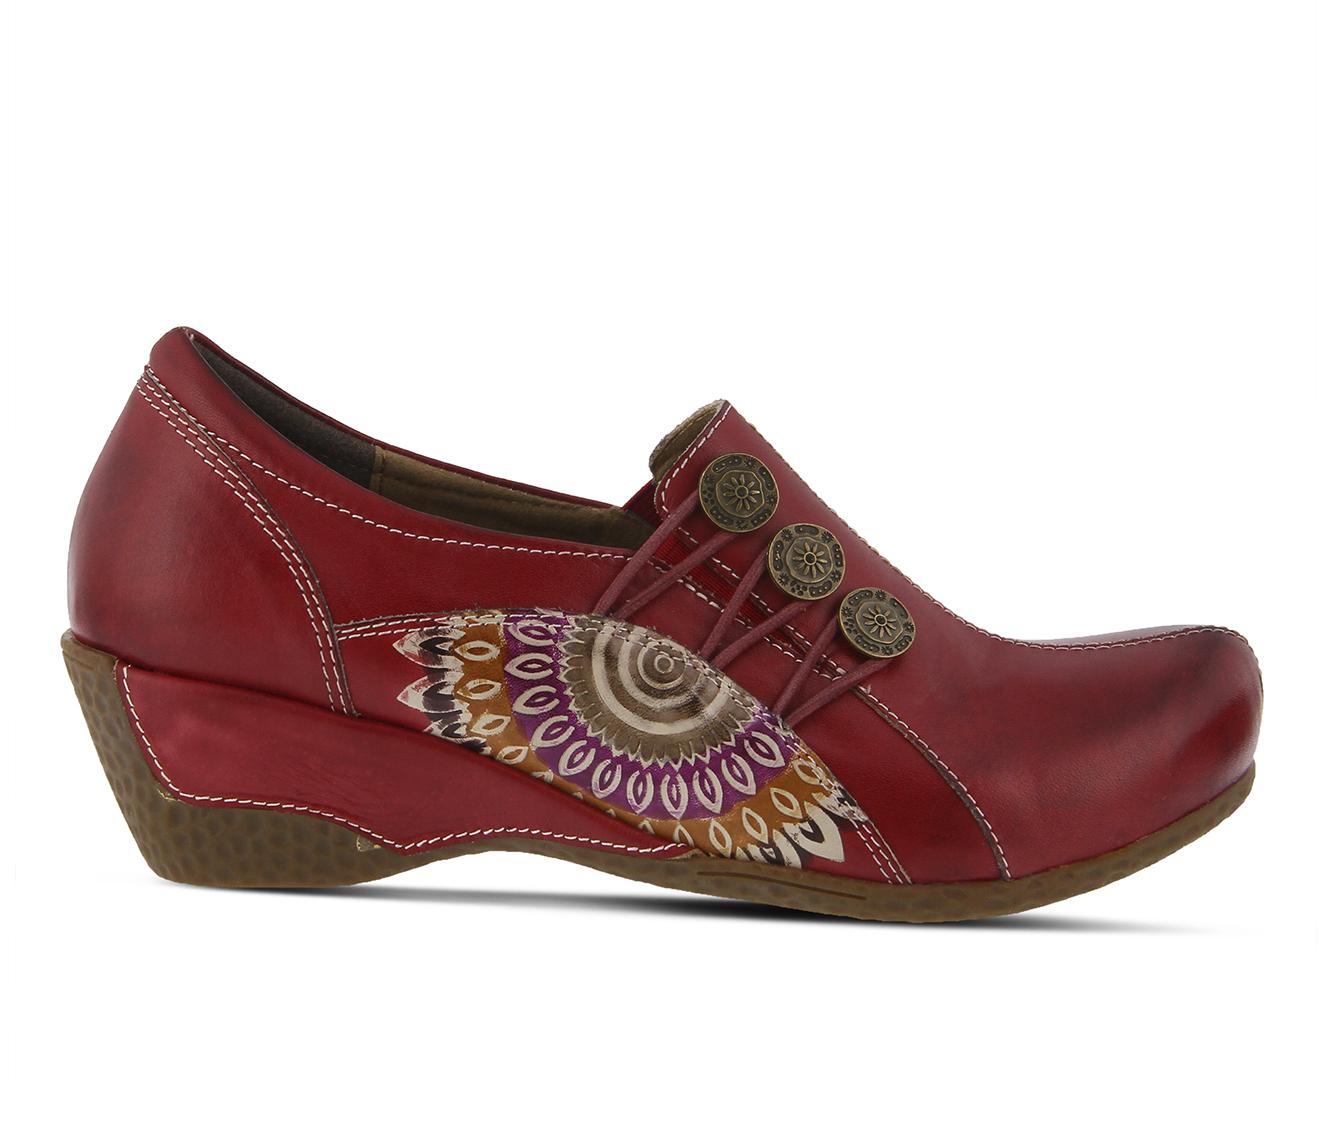 L'Artiste Agacia Women's Shoe (Red Leather)